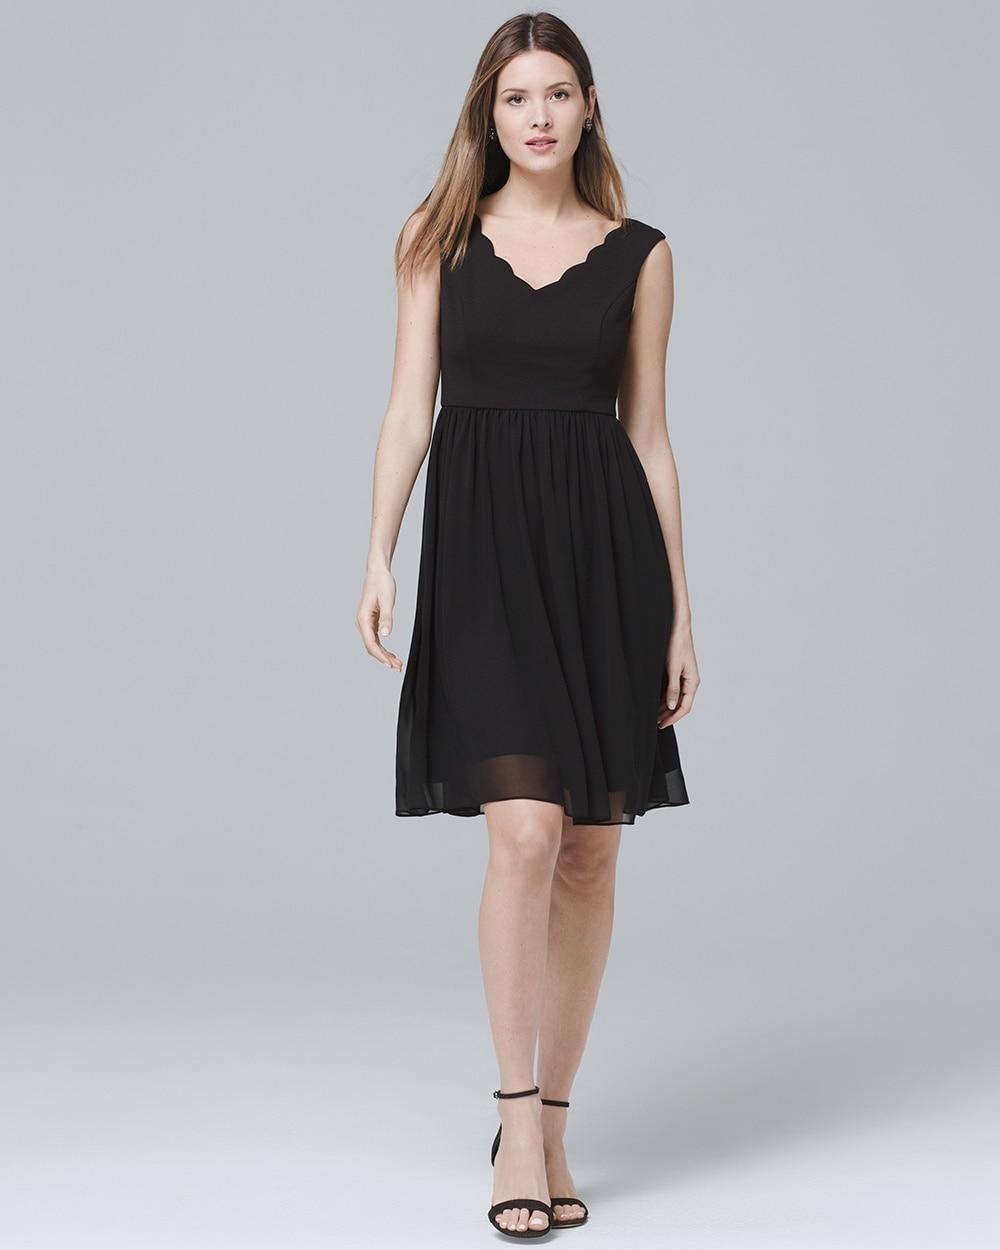 Scalloped Neck Black Fit And Flare Dress White House Black Market